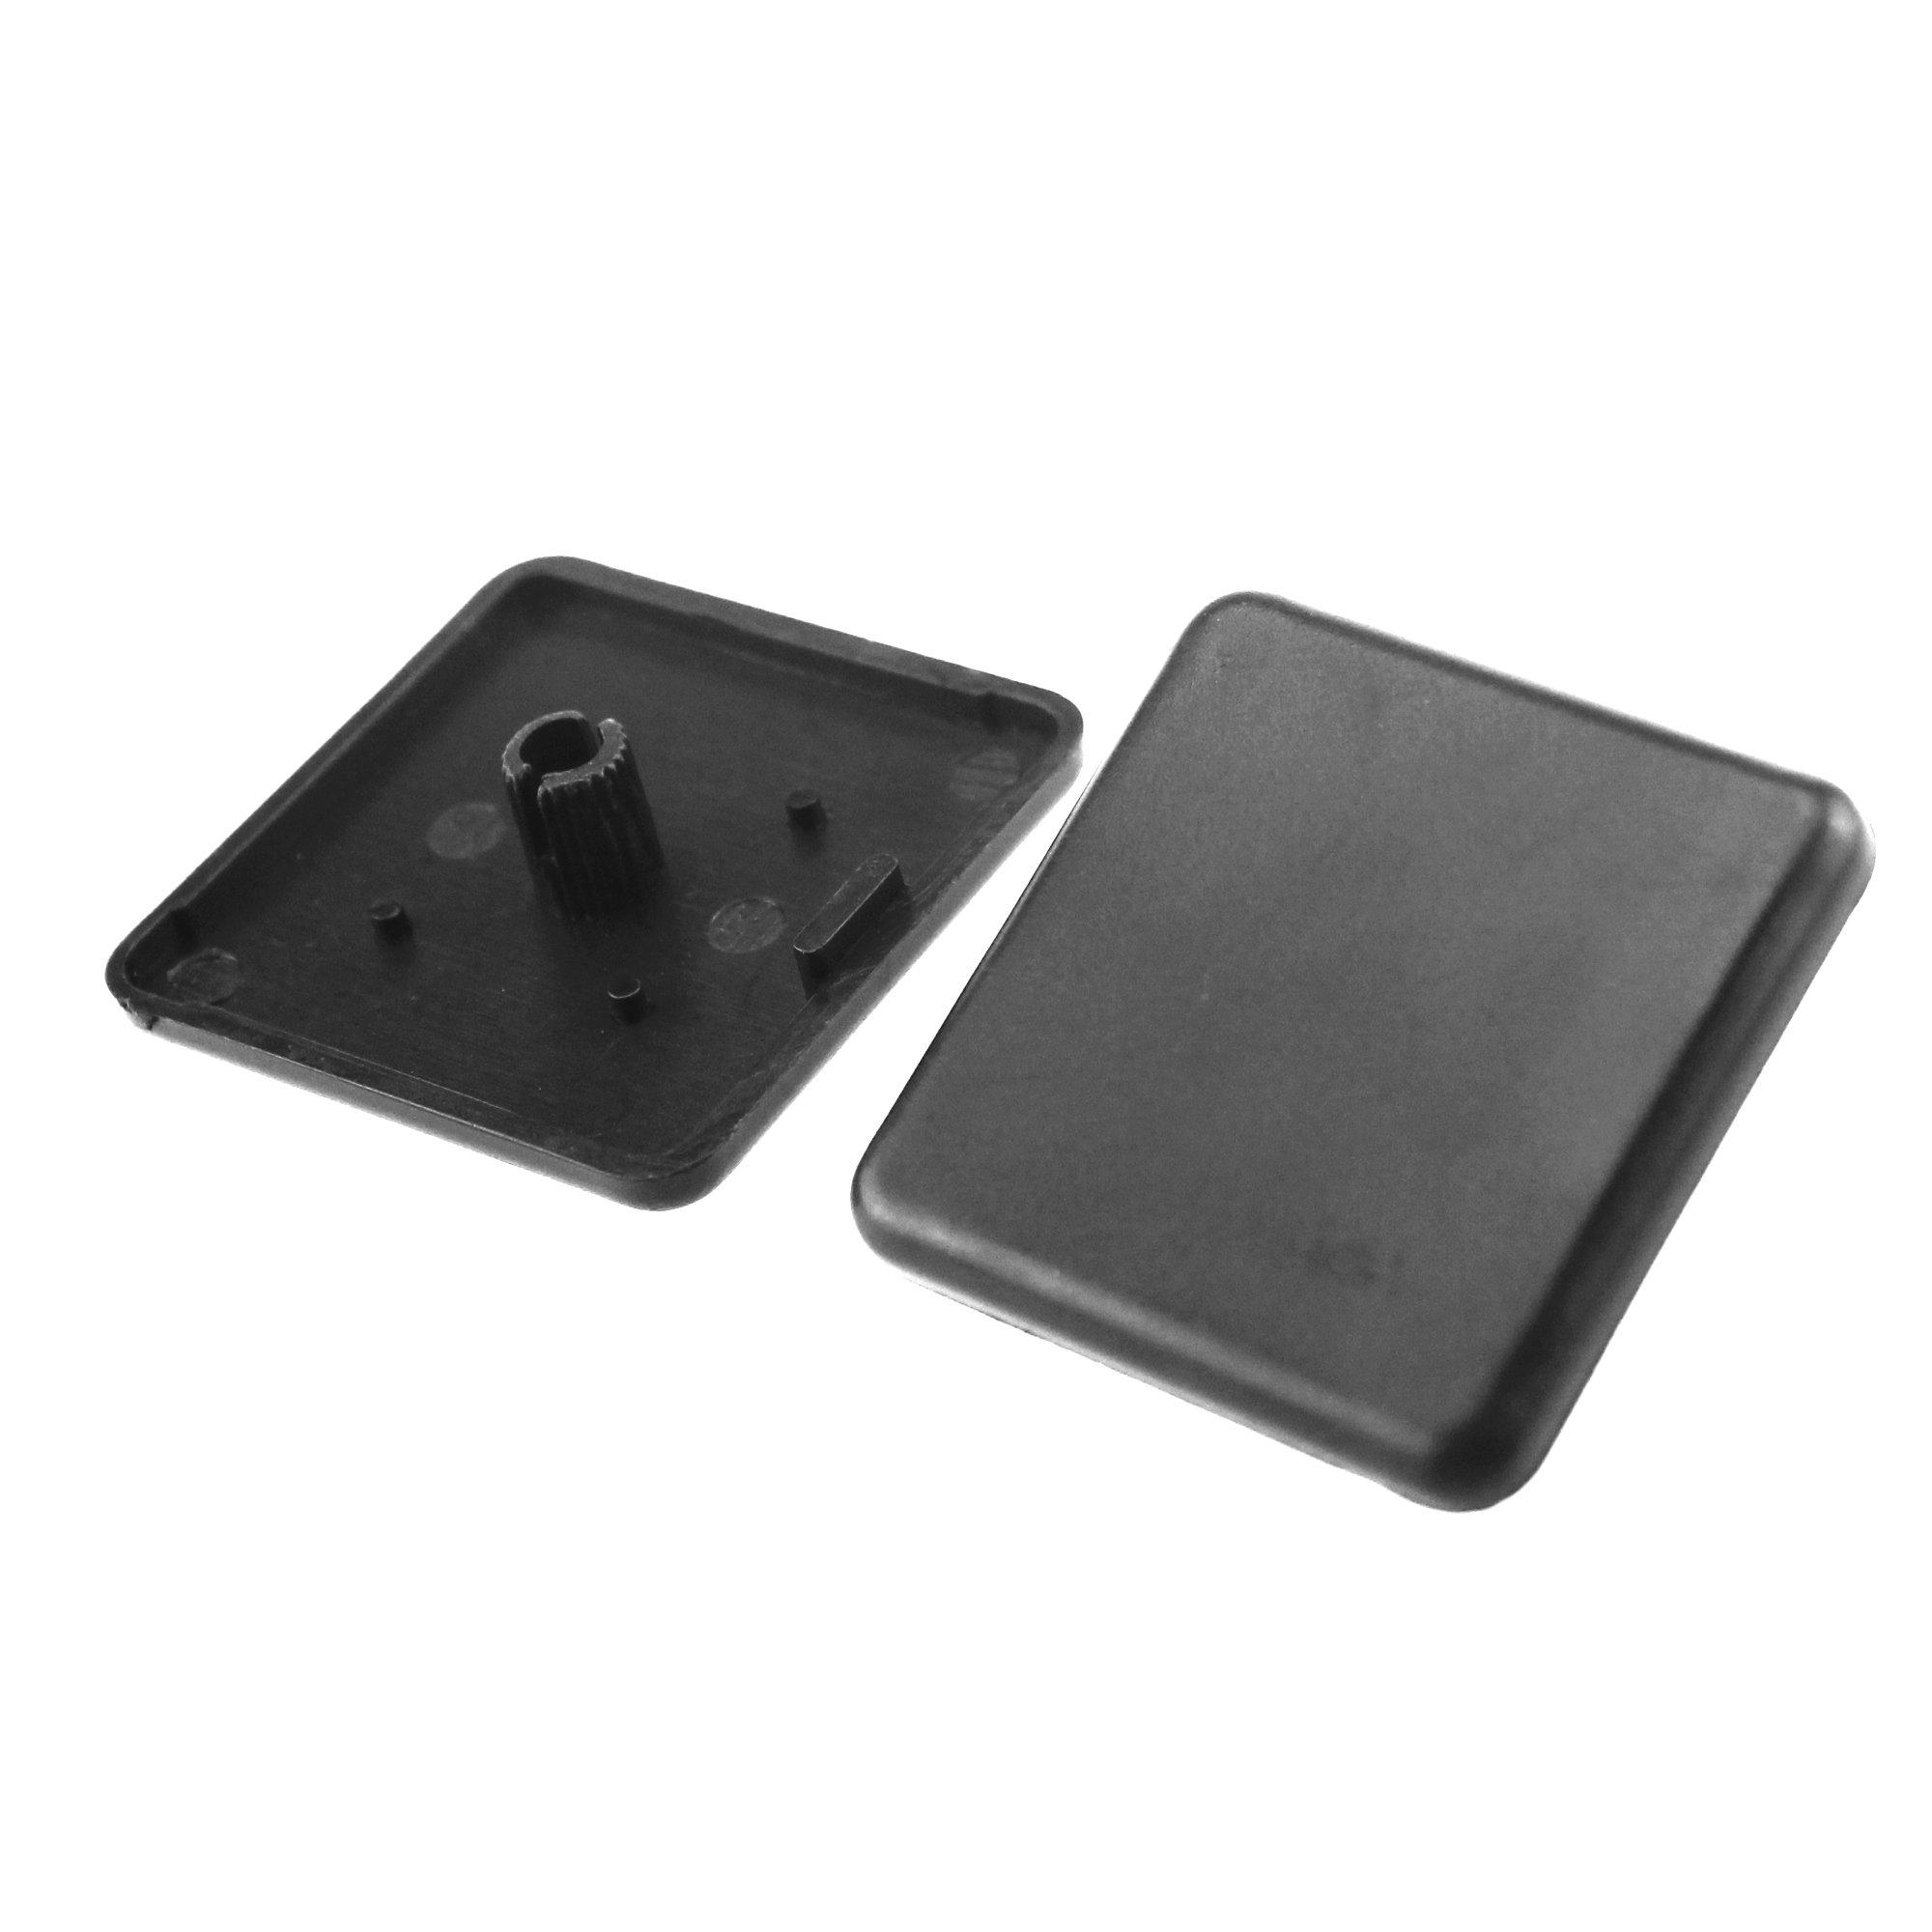 Iztoss Plastic ABS Accessories End Cap Black for Aluminum Extrusion 20pcs 40x40mm